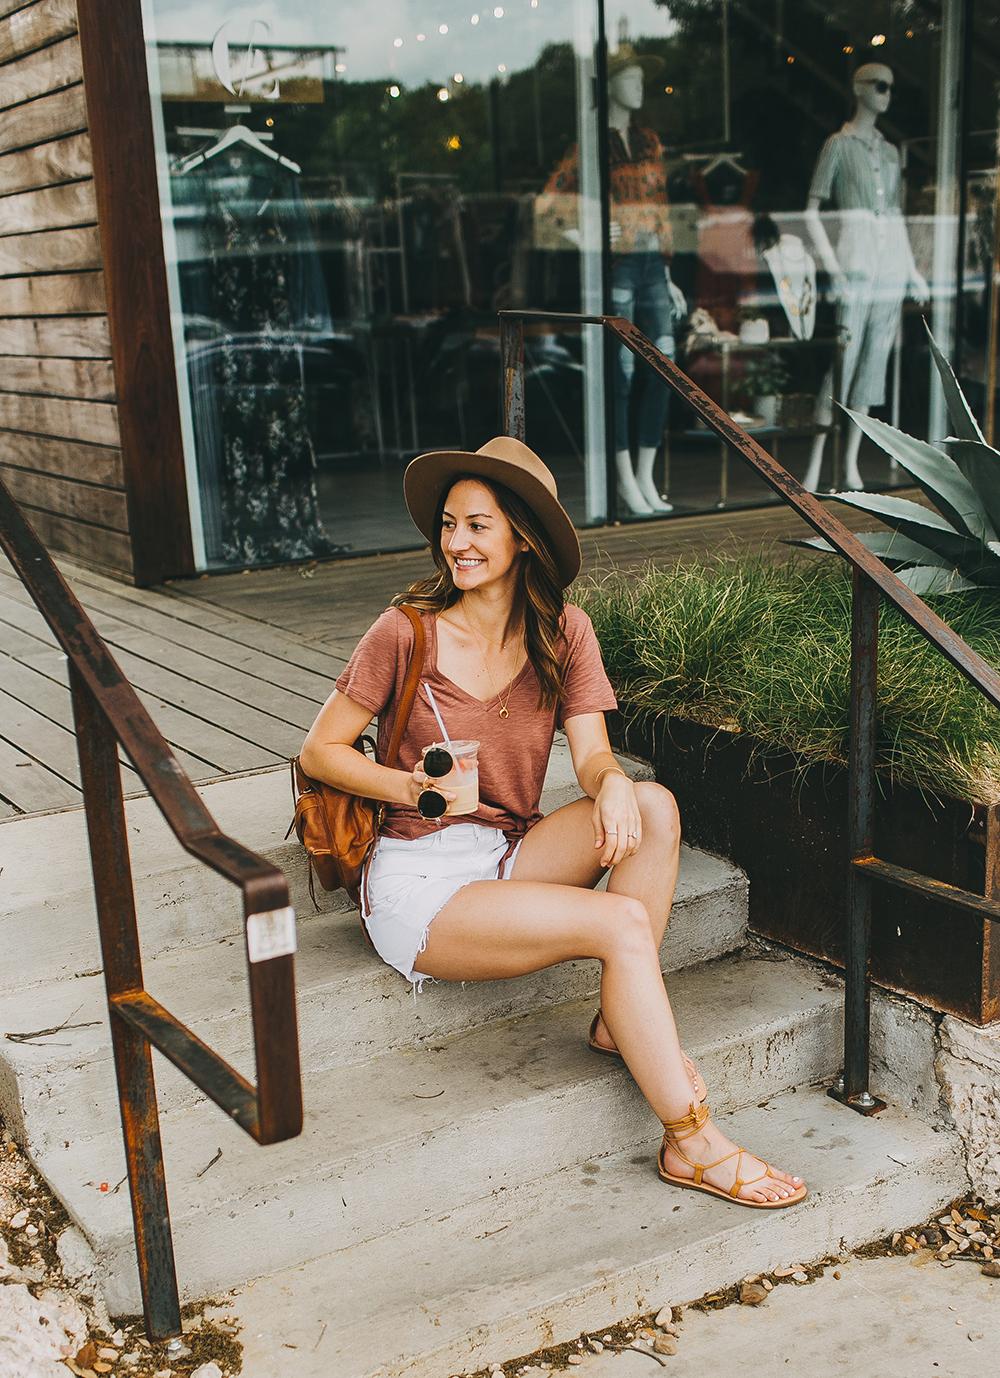 livvyland-blog-olivia-watson-express-one-eleven-knot-front-v-neck-tee-austin-texas-fashion-blogger-1